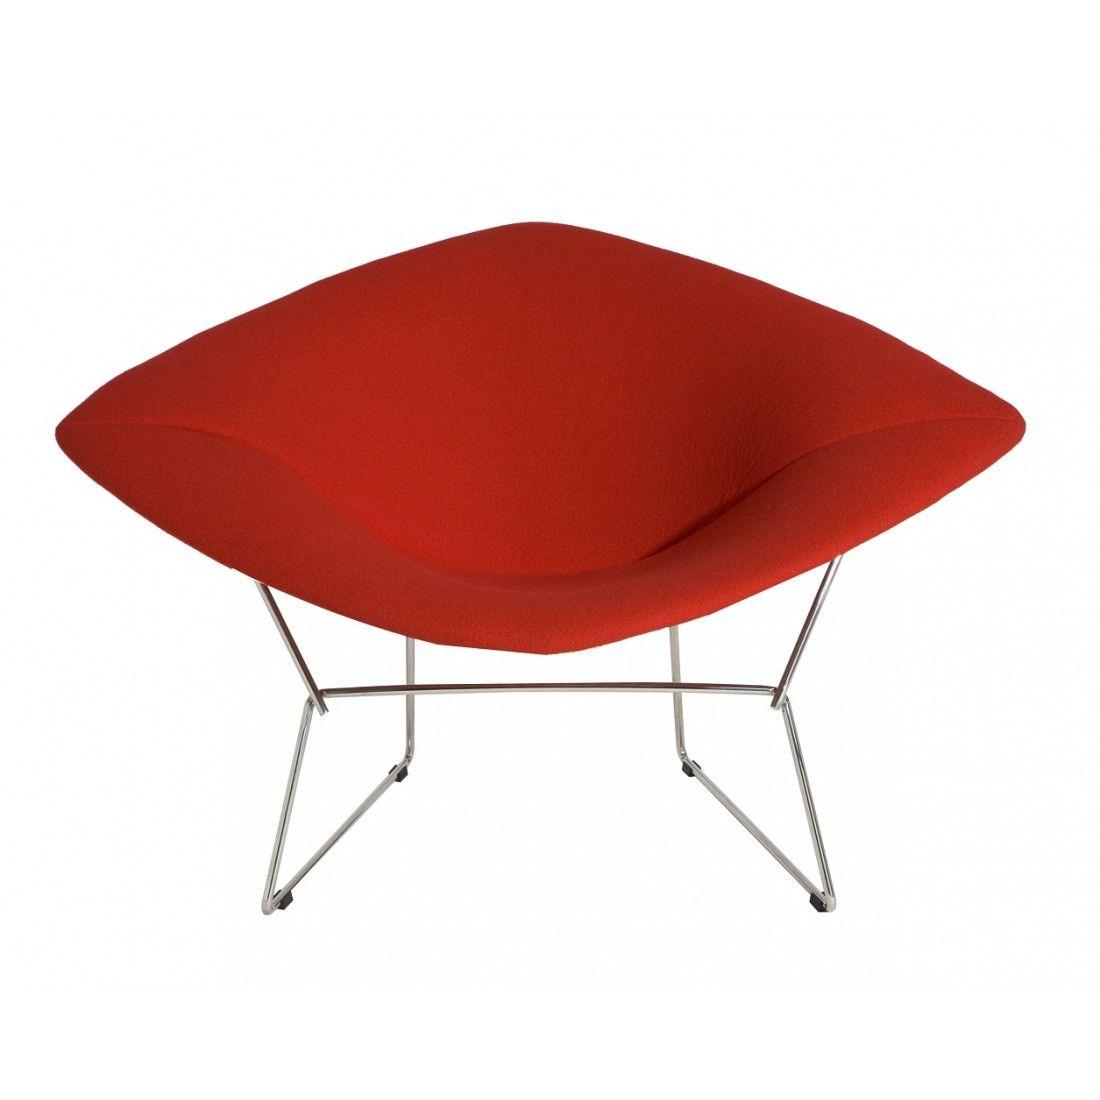 Fully Upholstered Diamond Chair - Red | Harry bertoia, Mid century ...